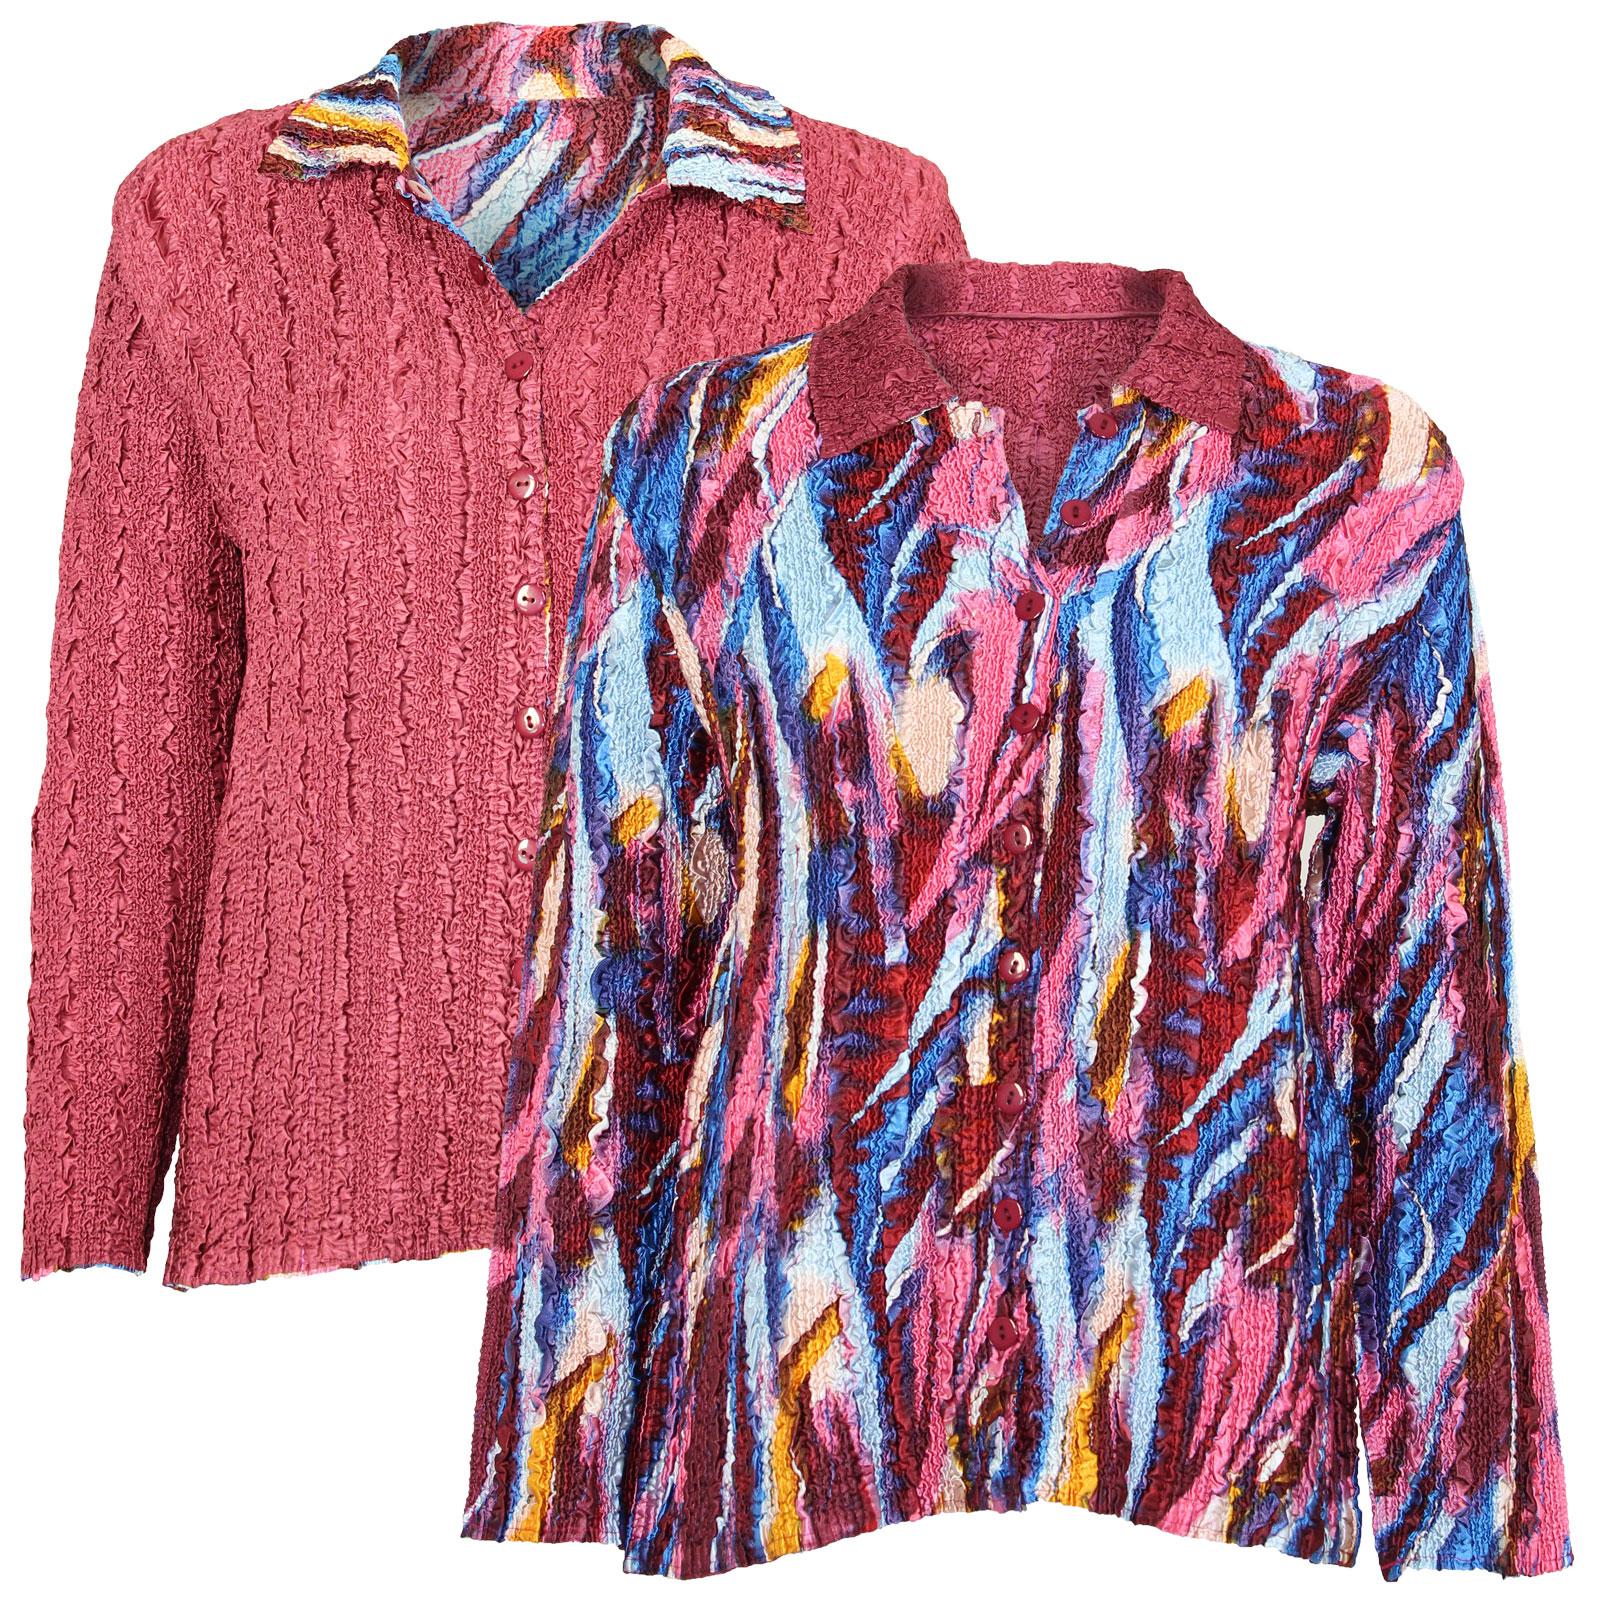 Wholesale Magic Crush - Reversible Jackets #14015 - 1X-2X